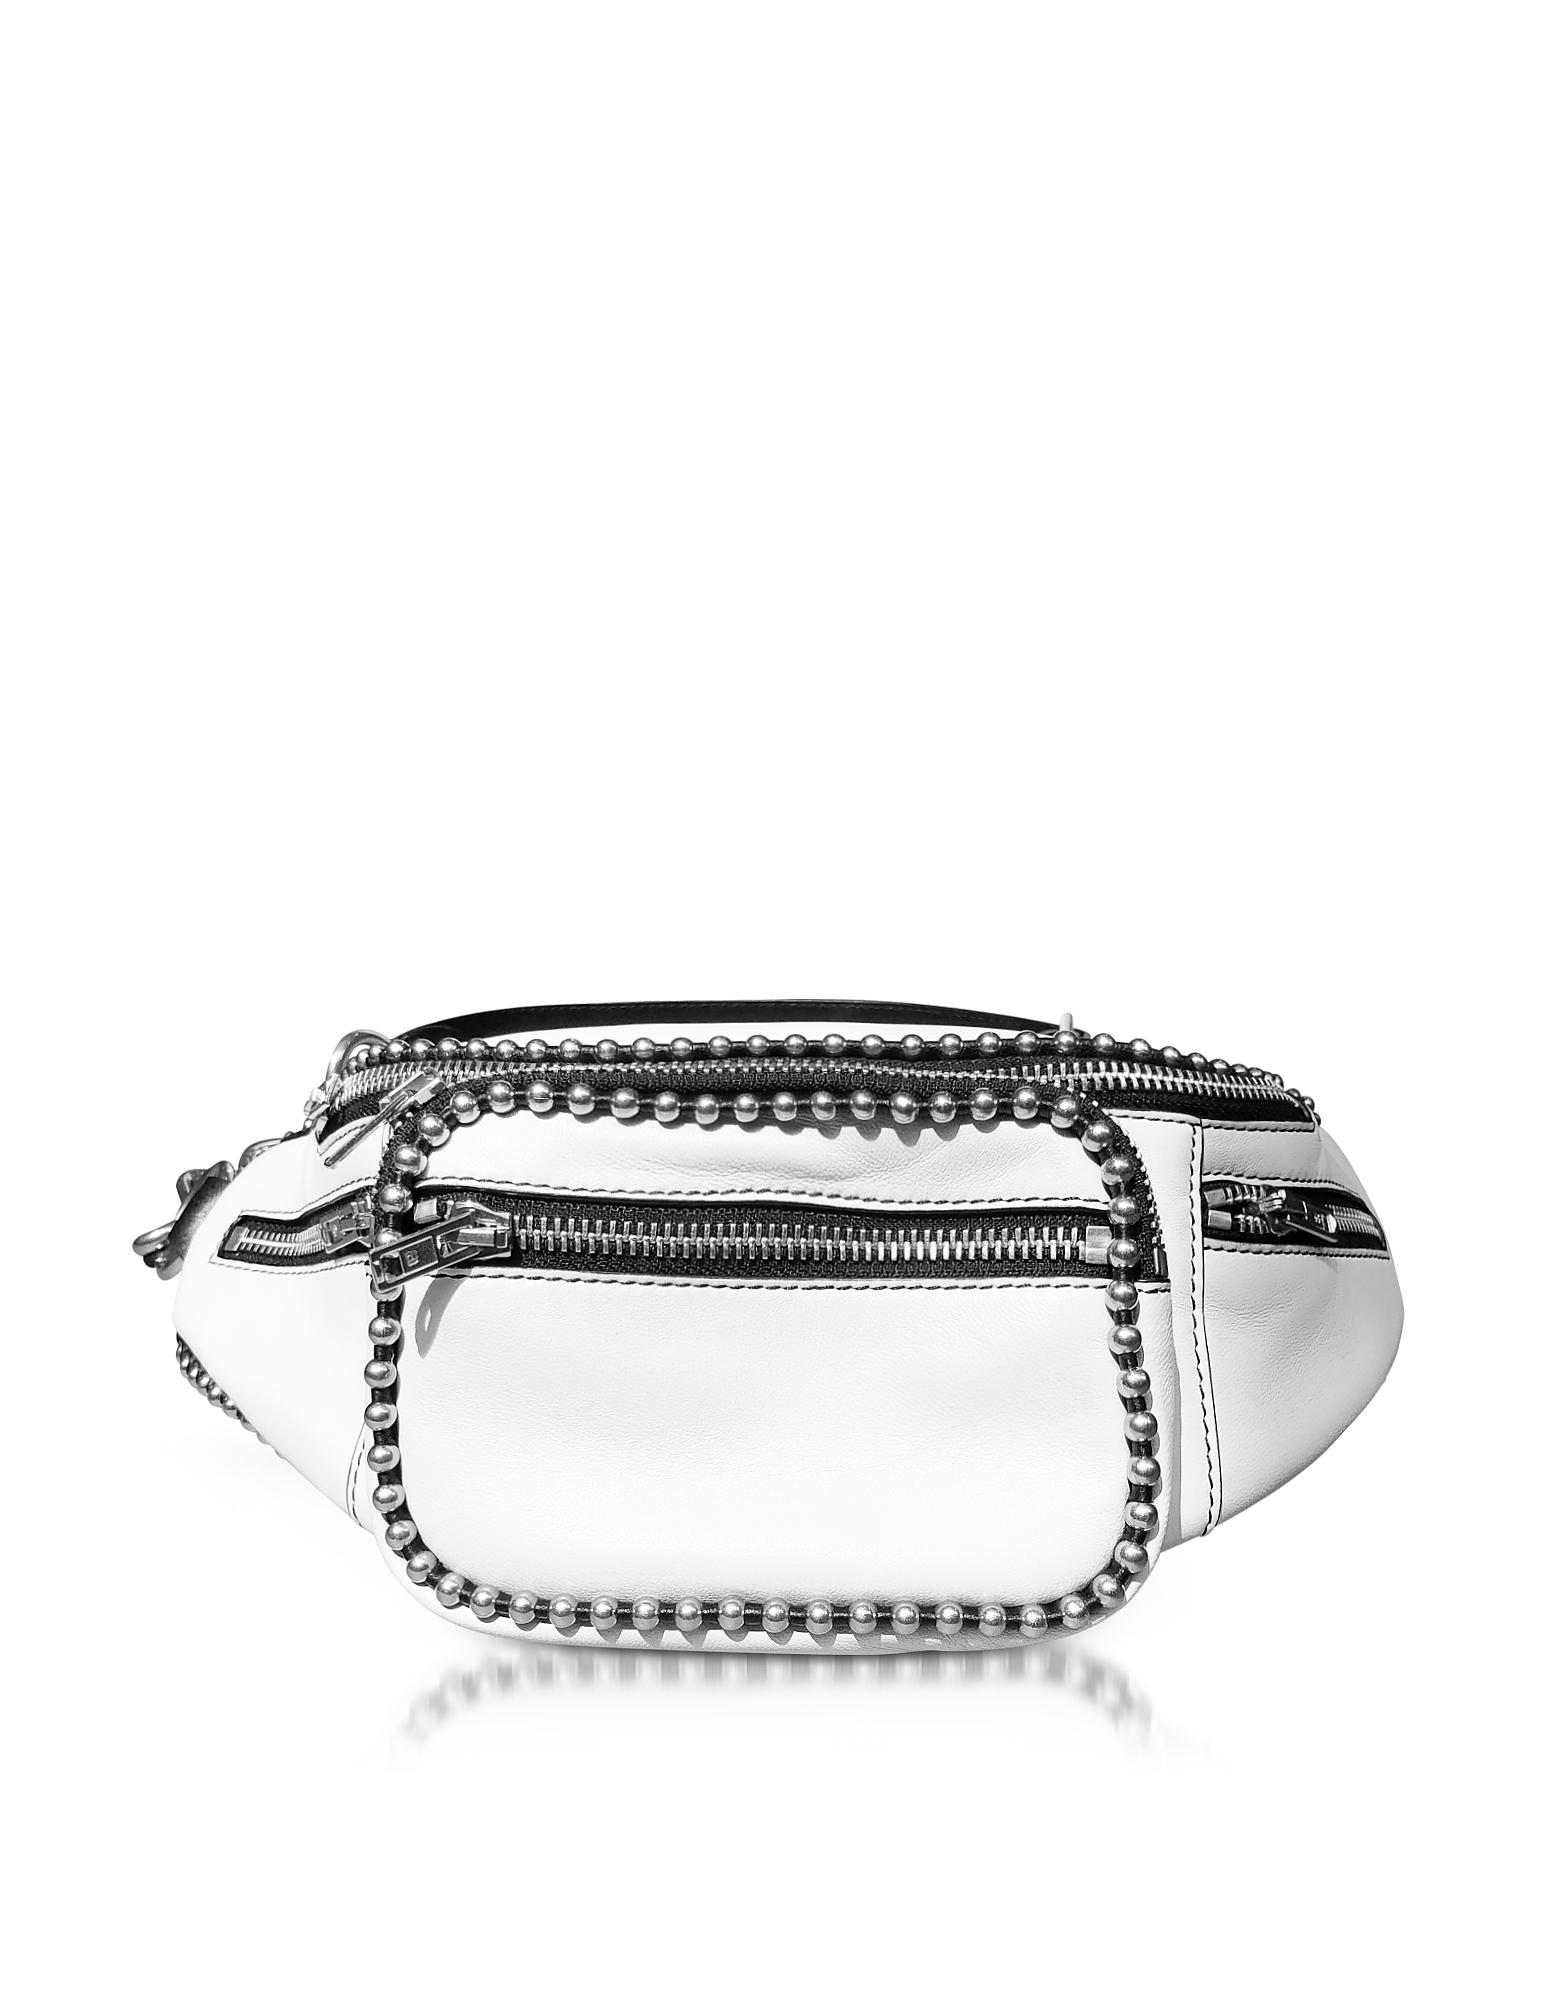 Attica White Leather Fanny Pack/Belt Bag